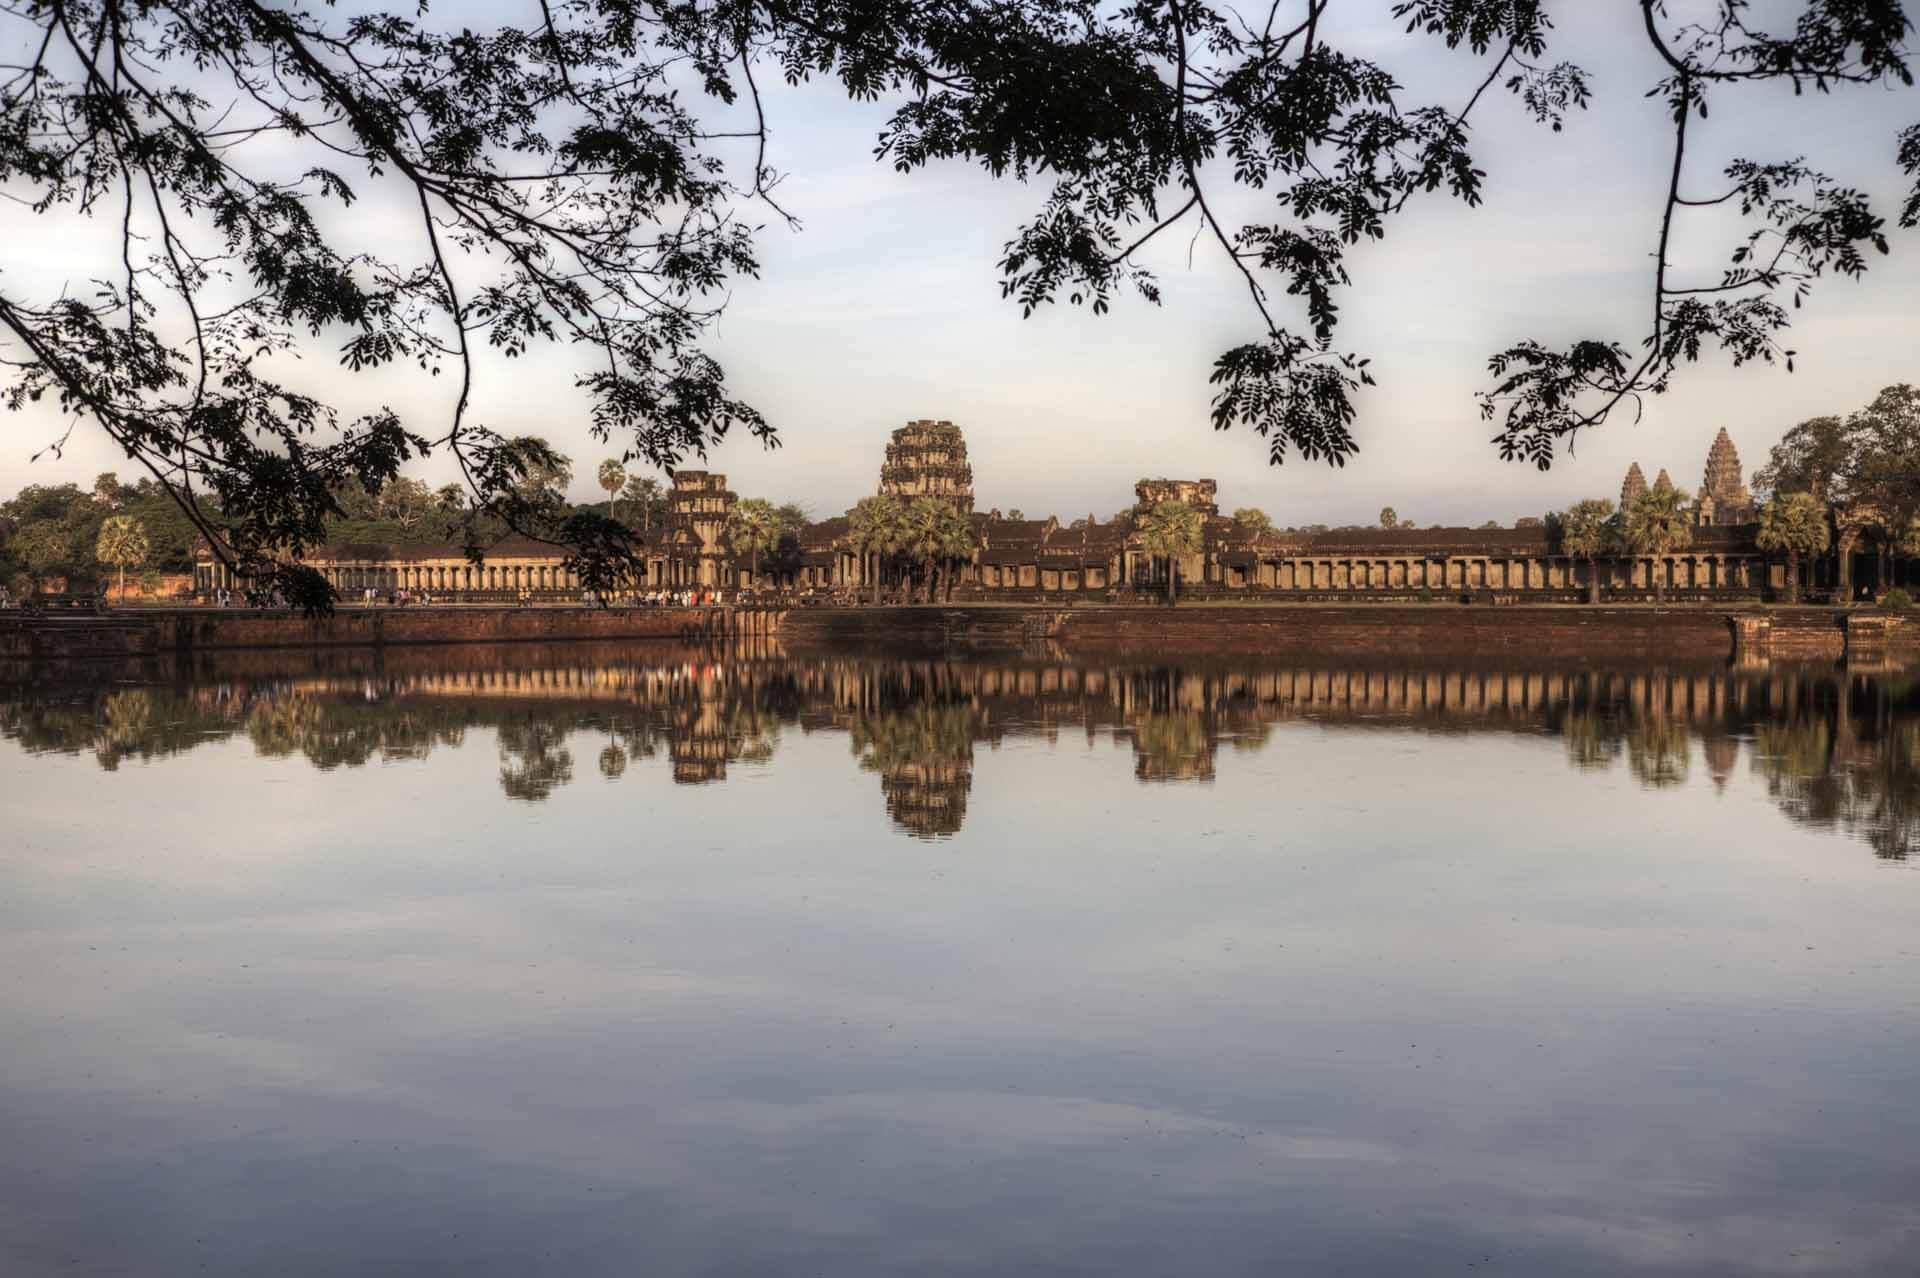 Kambodscha_Angkor_145